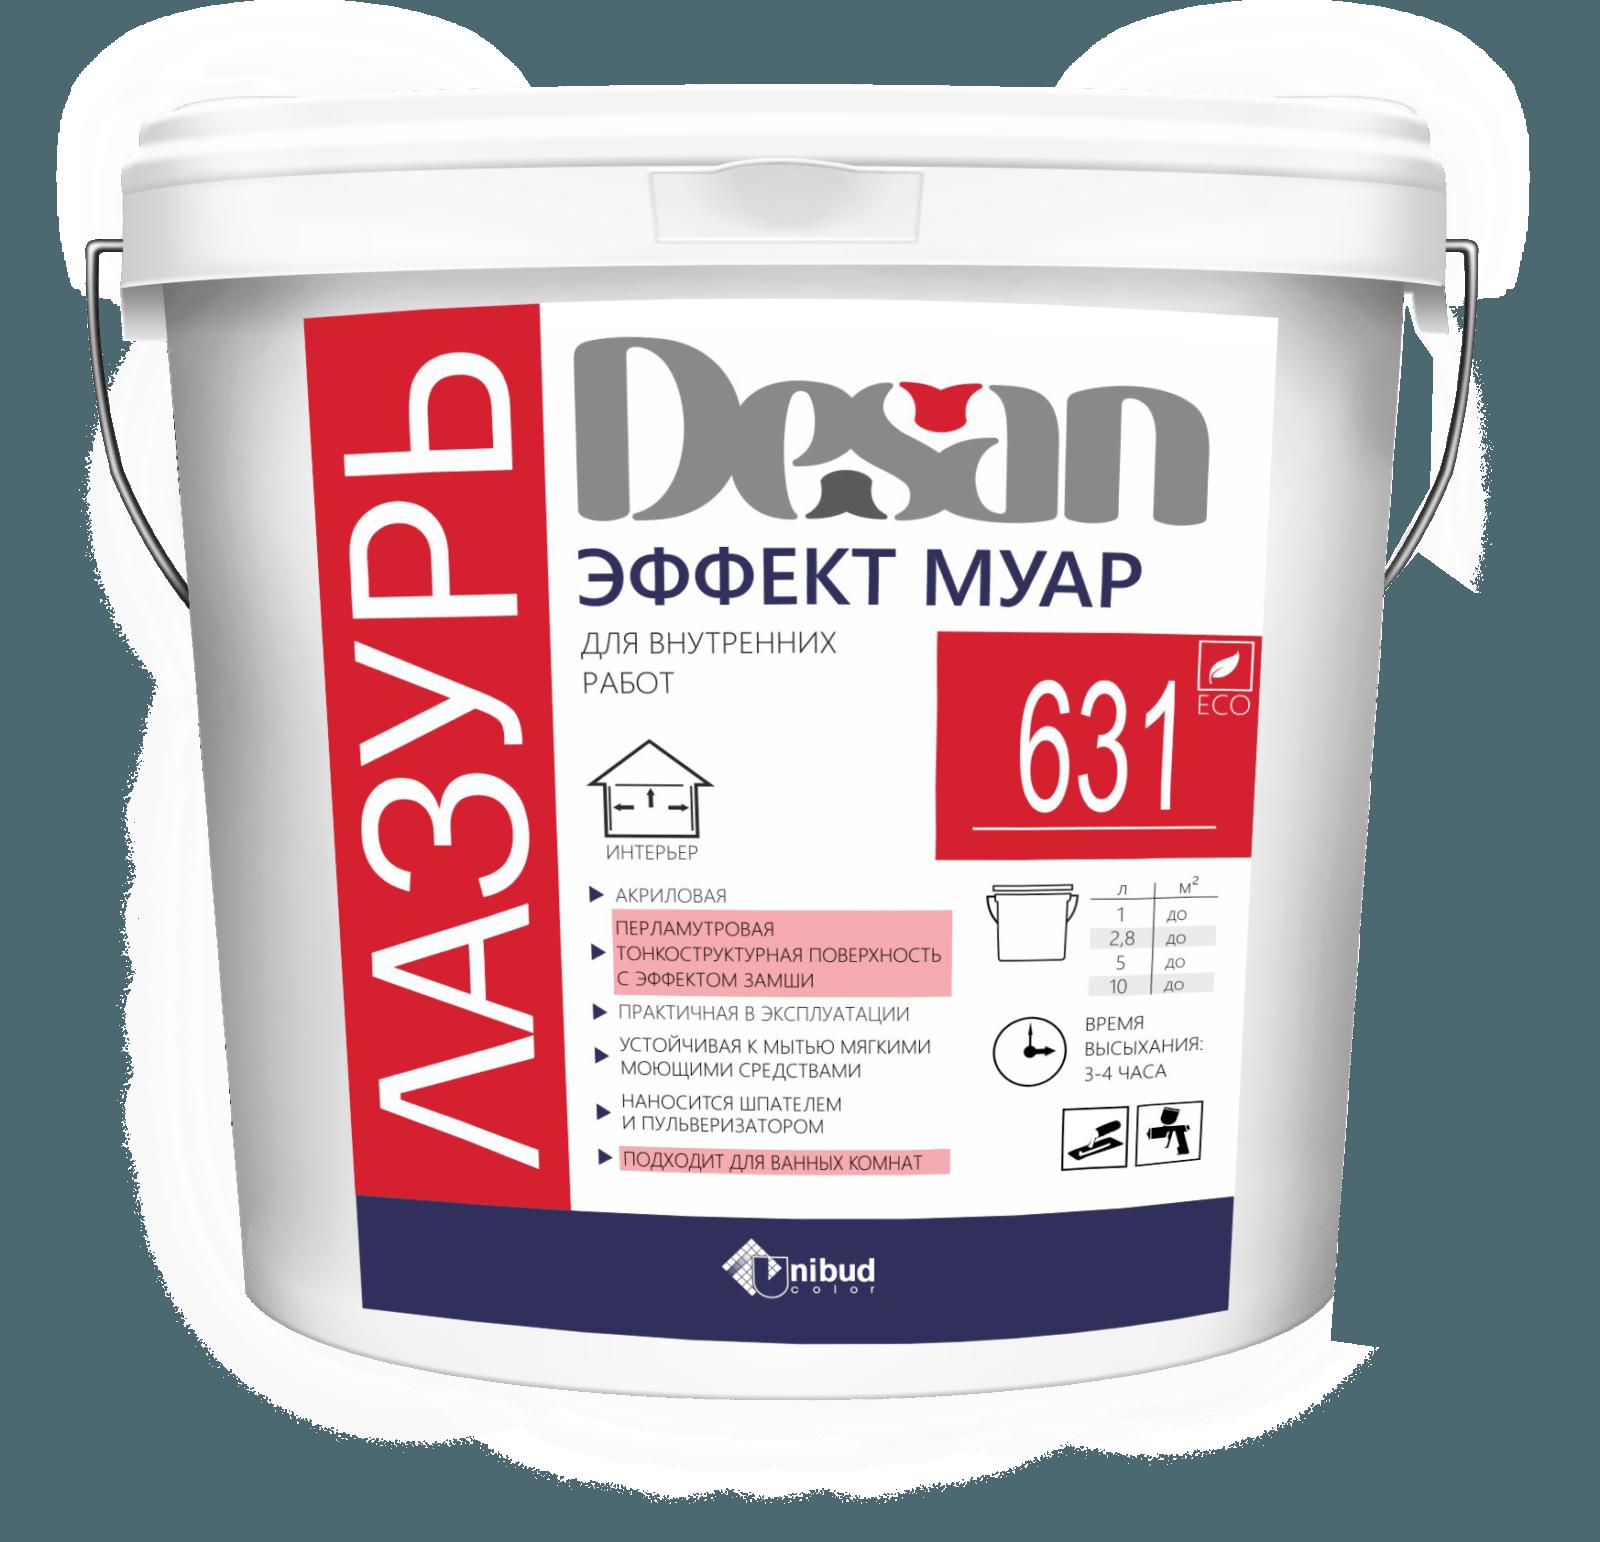 Desan Эффект Муар ВД-АК-201